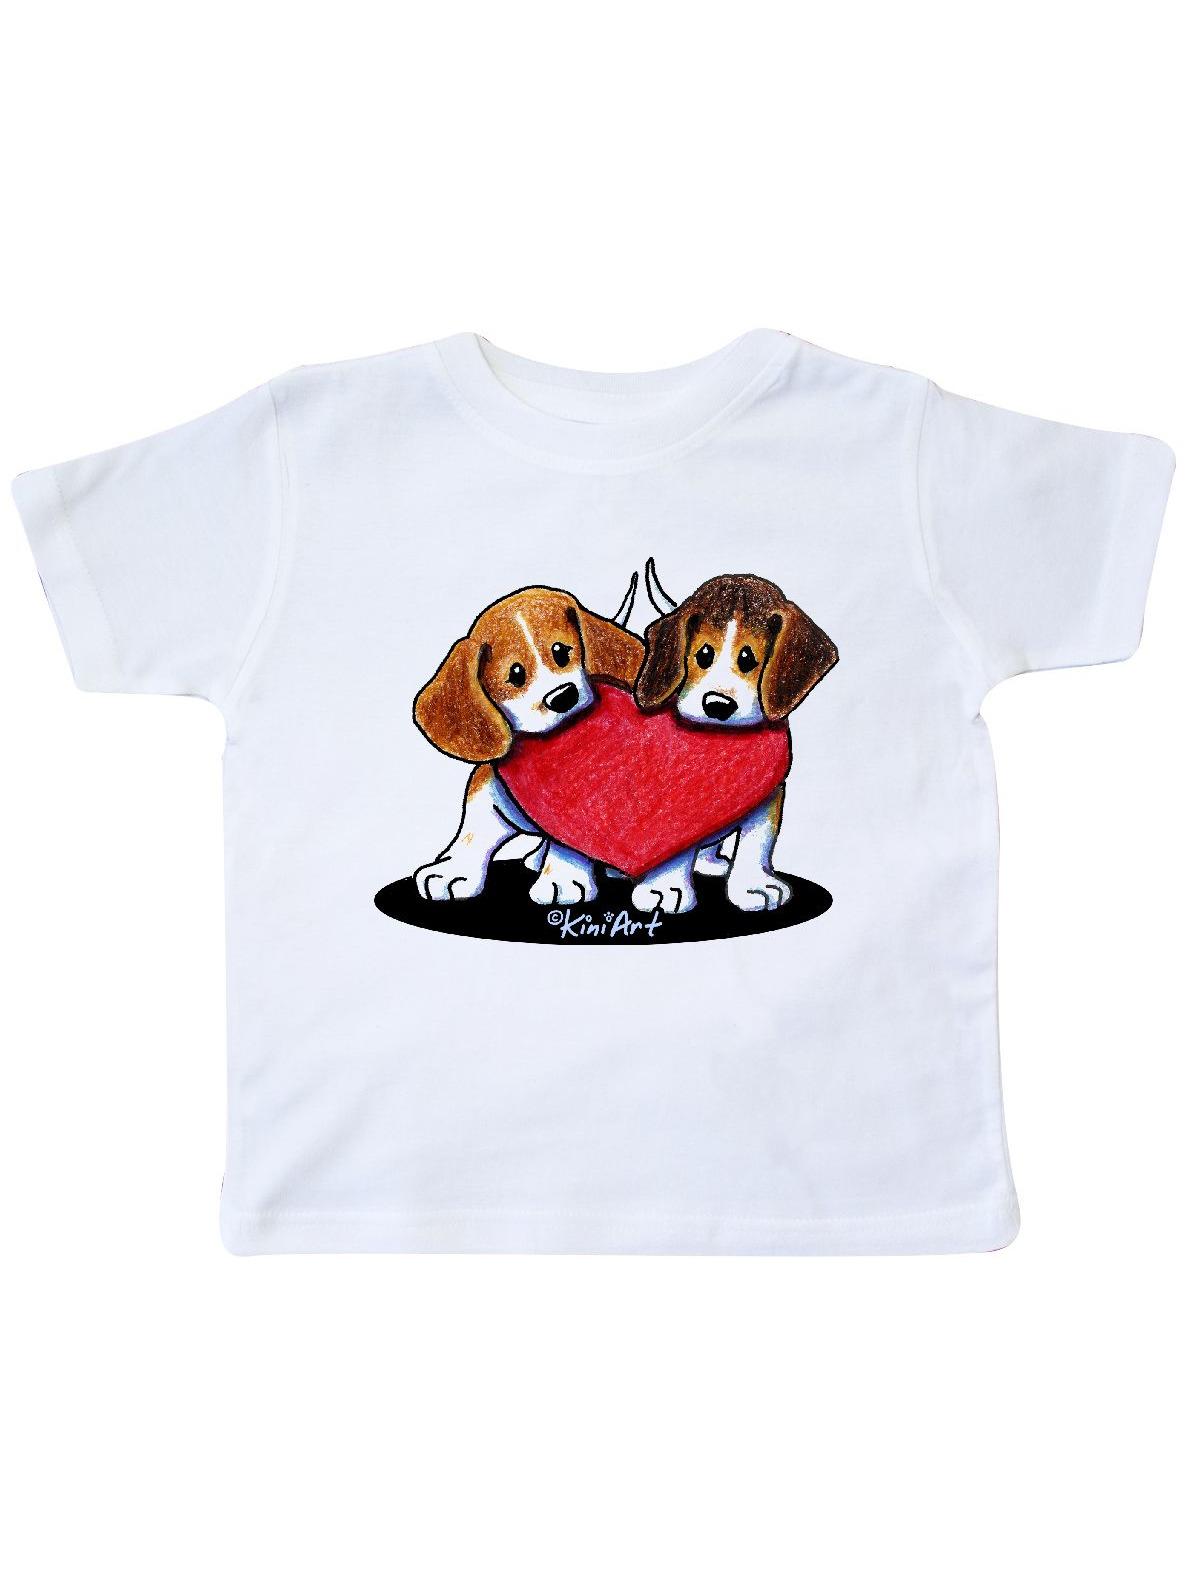 Beagle Heartfelt Duo Toddler T-Shirt - KiniArt